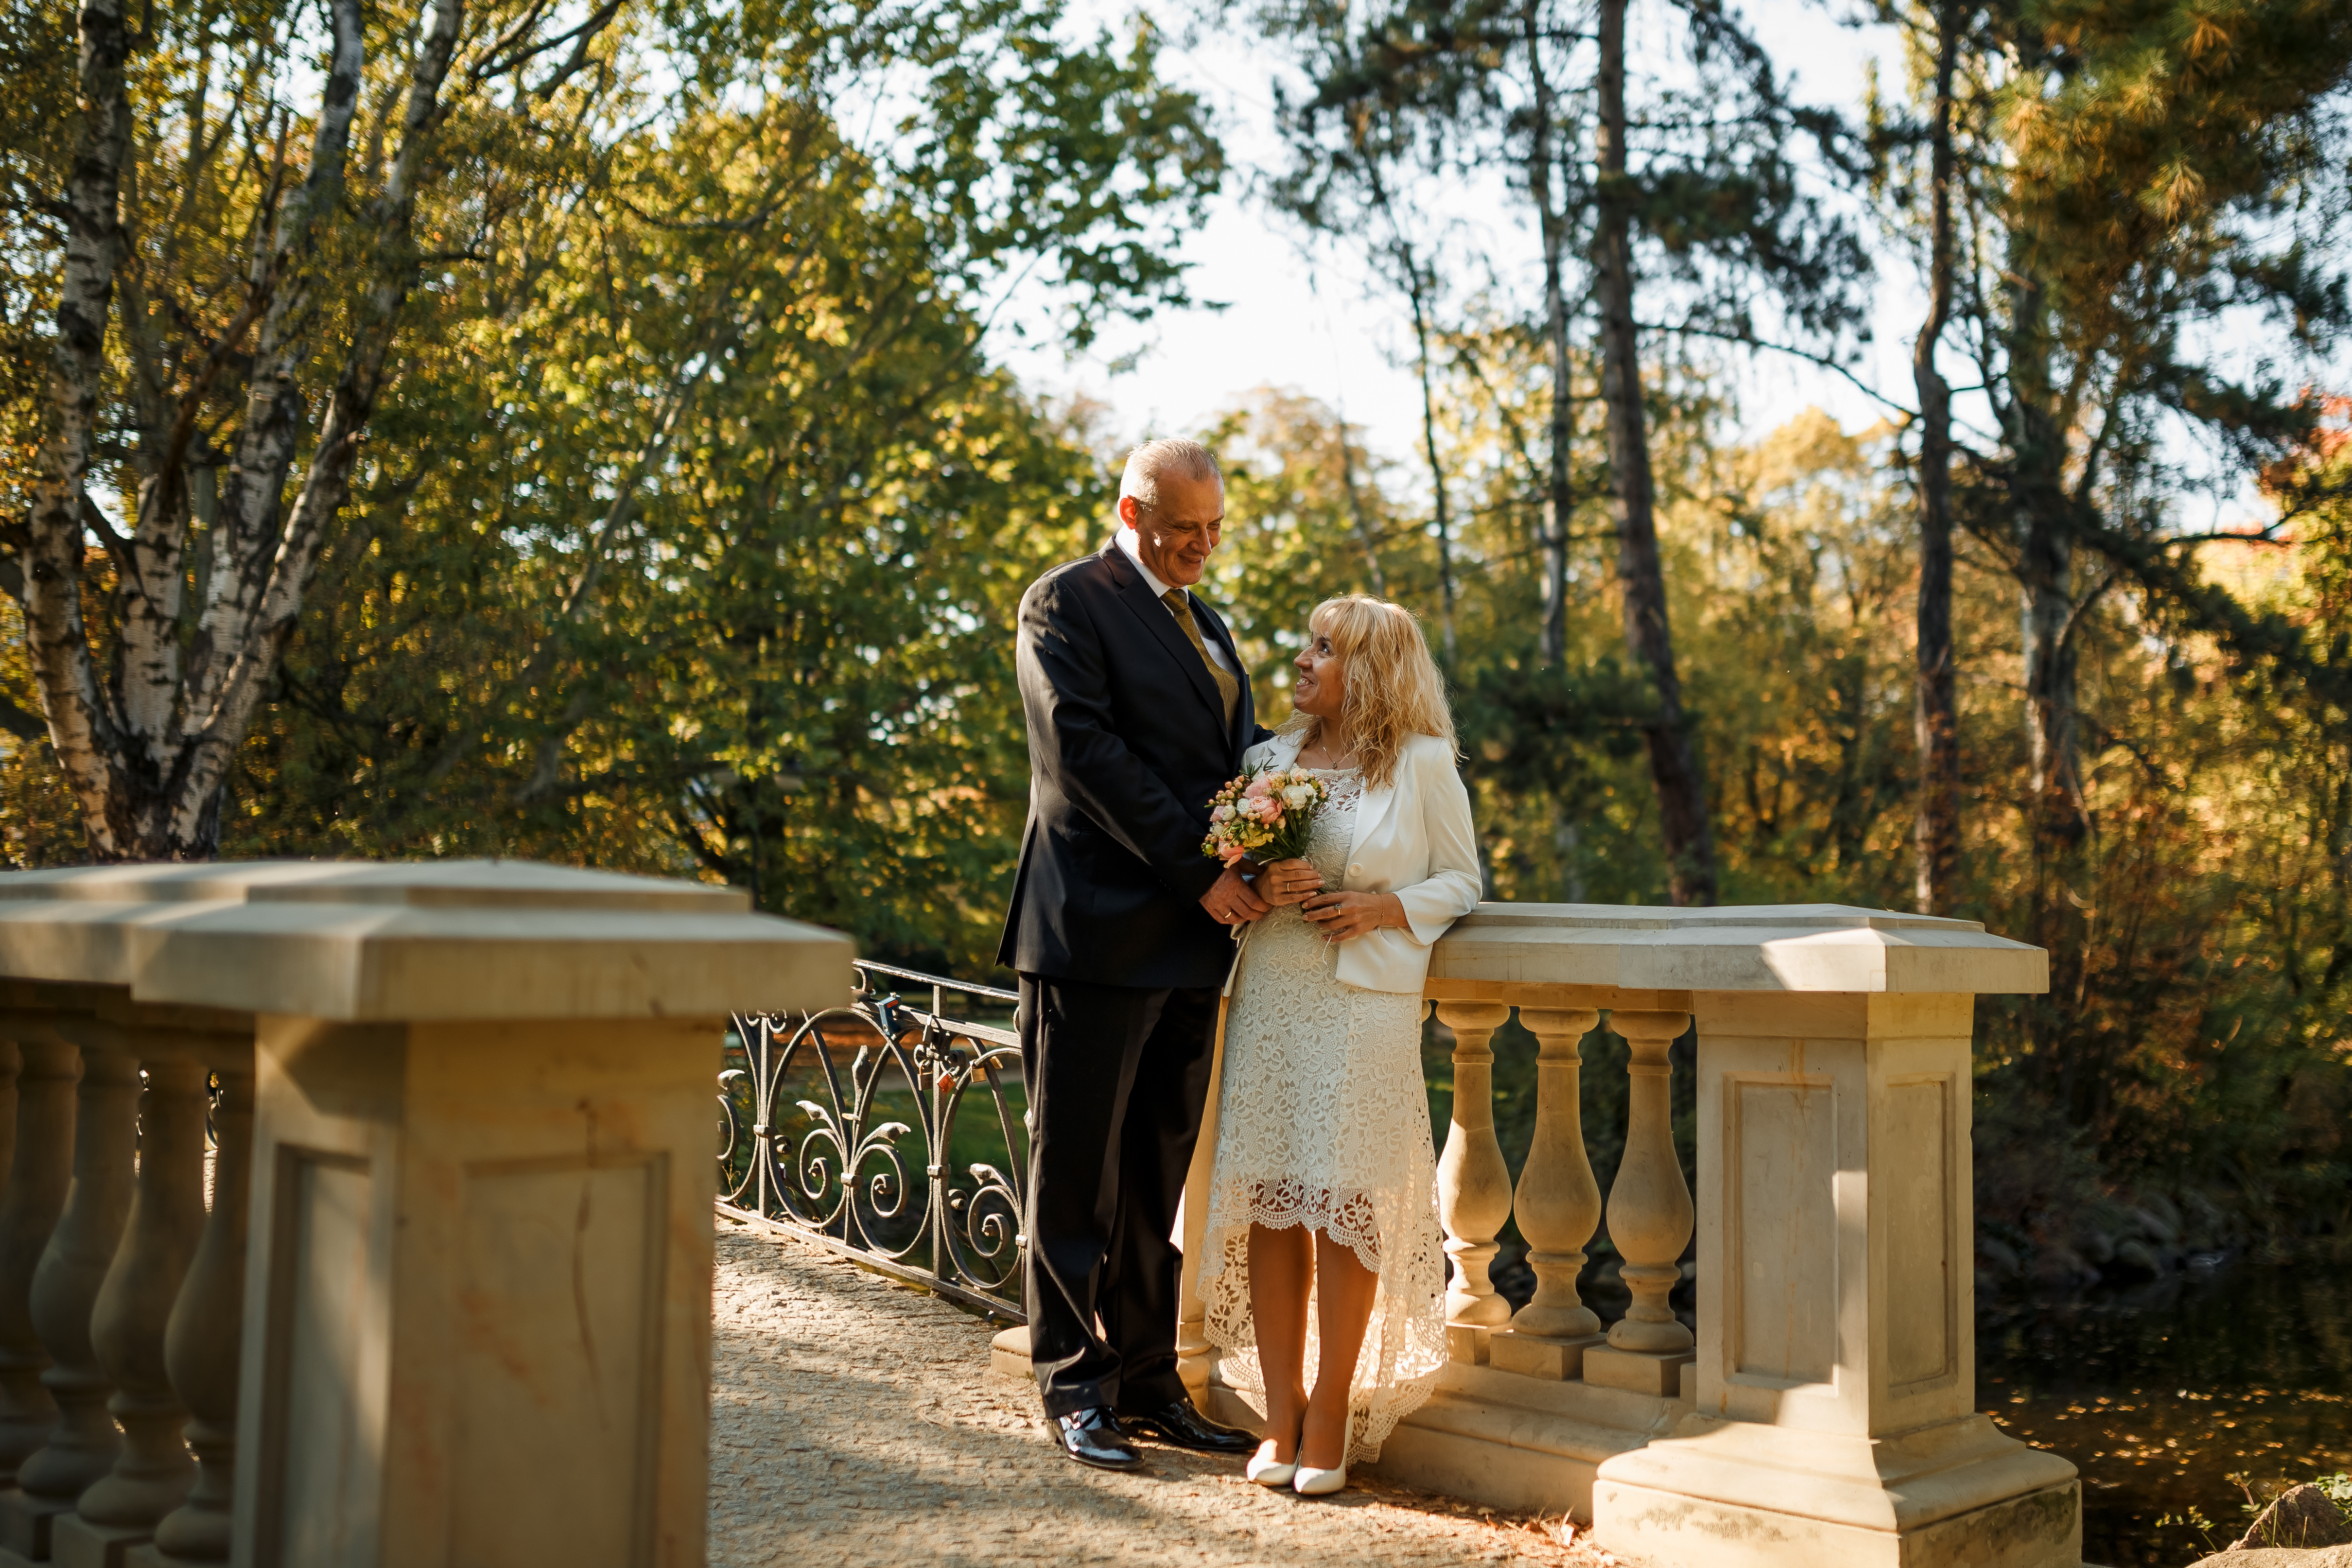 Замуж за поляка, какие трудности и сложности предстоят перед тем как выйти замуж за посляка